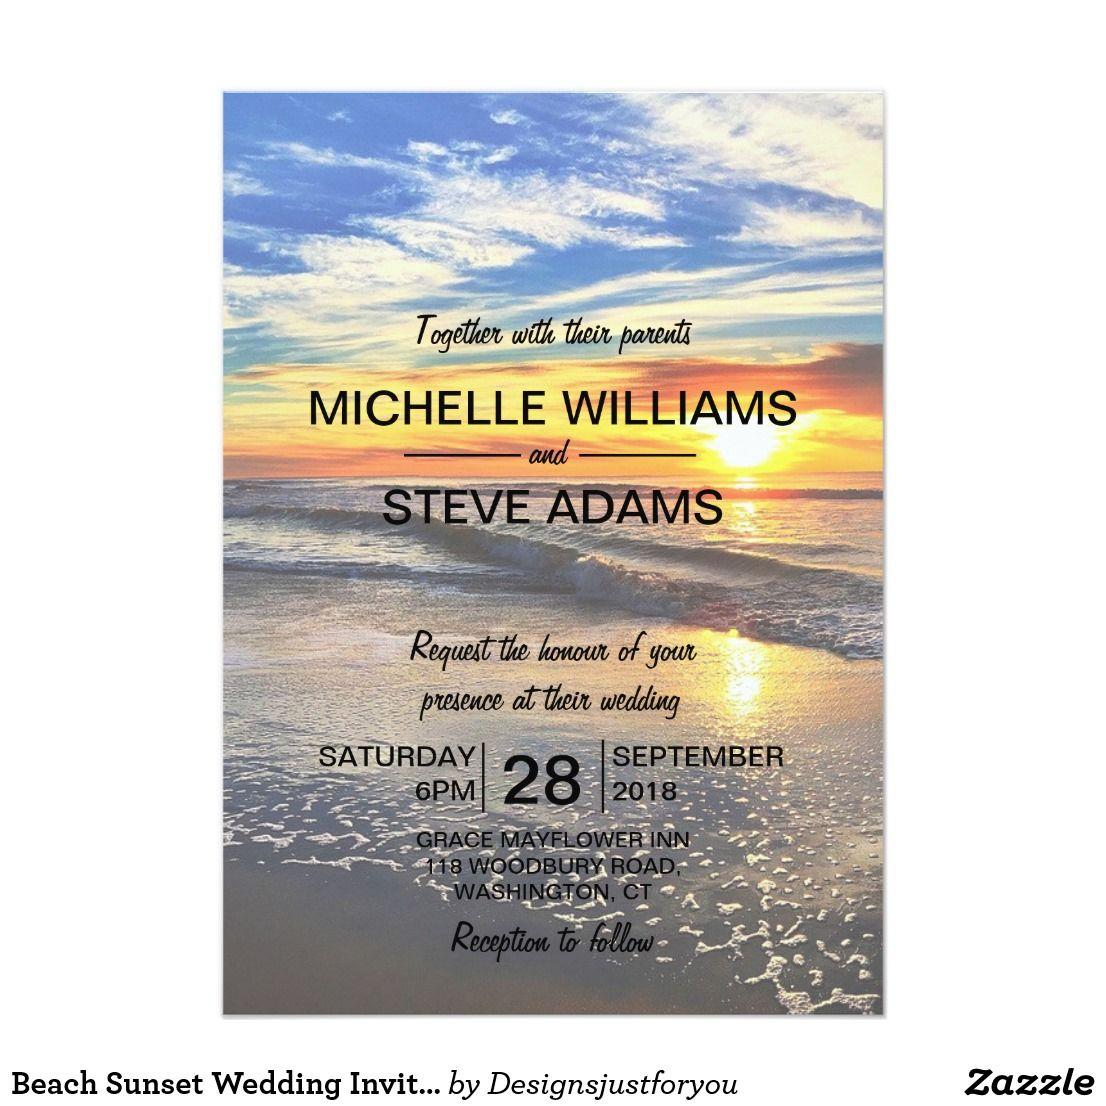 Beach Sunset Wedding Invitation Sunset wedding, Beach